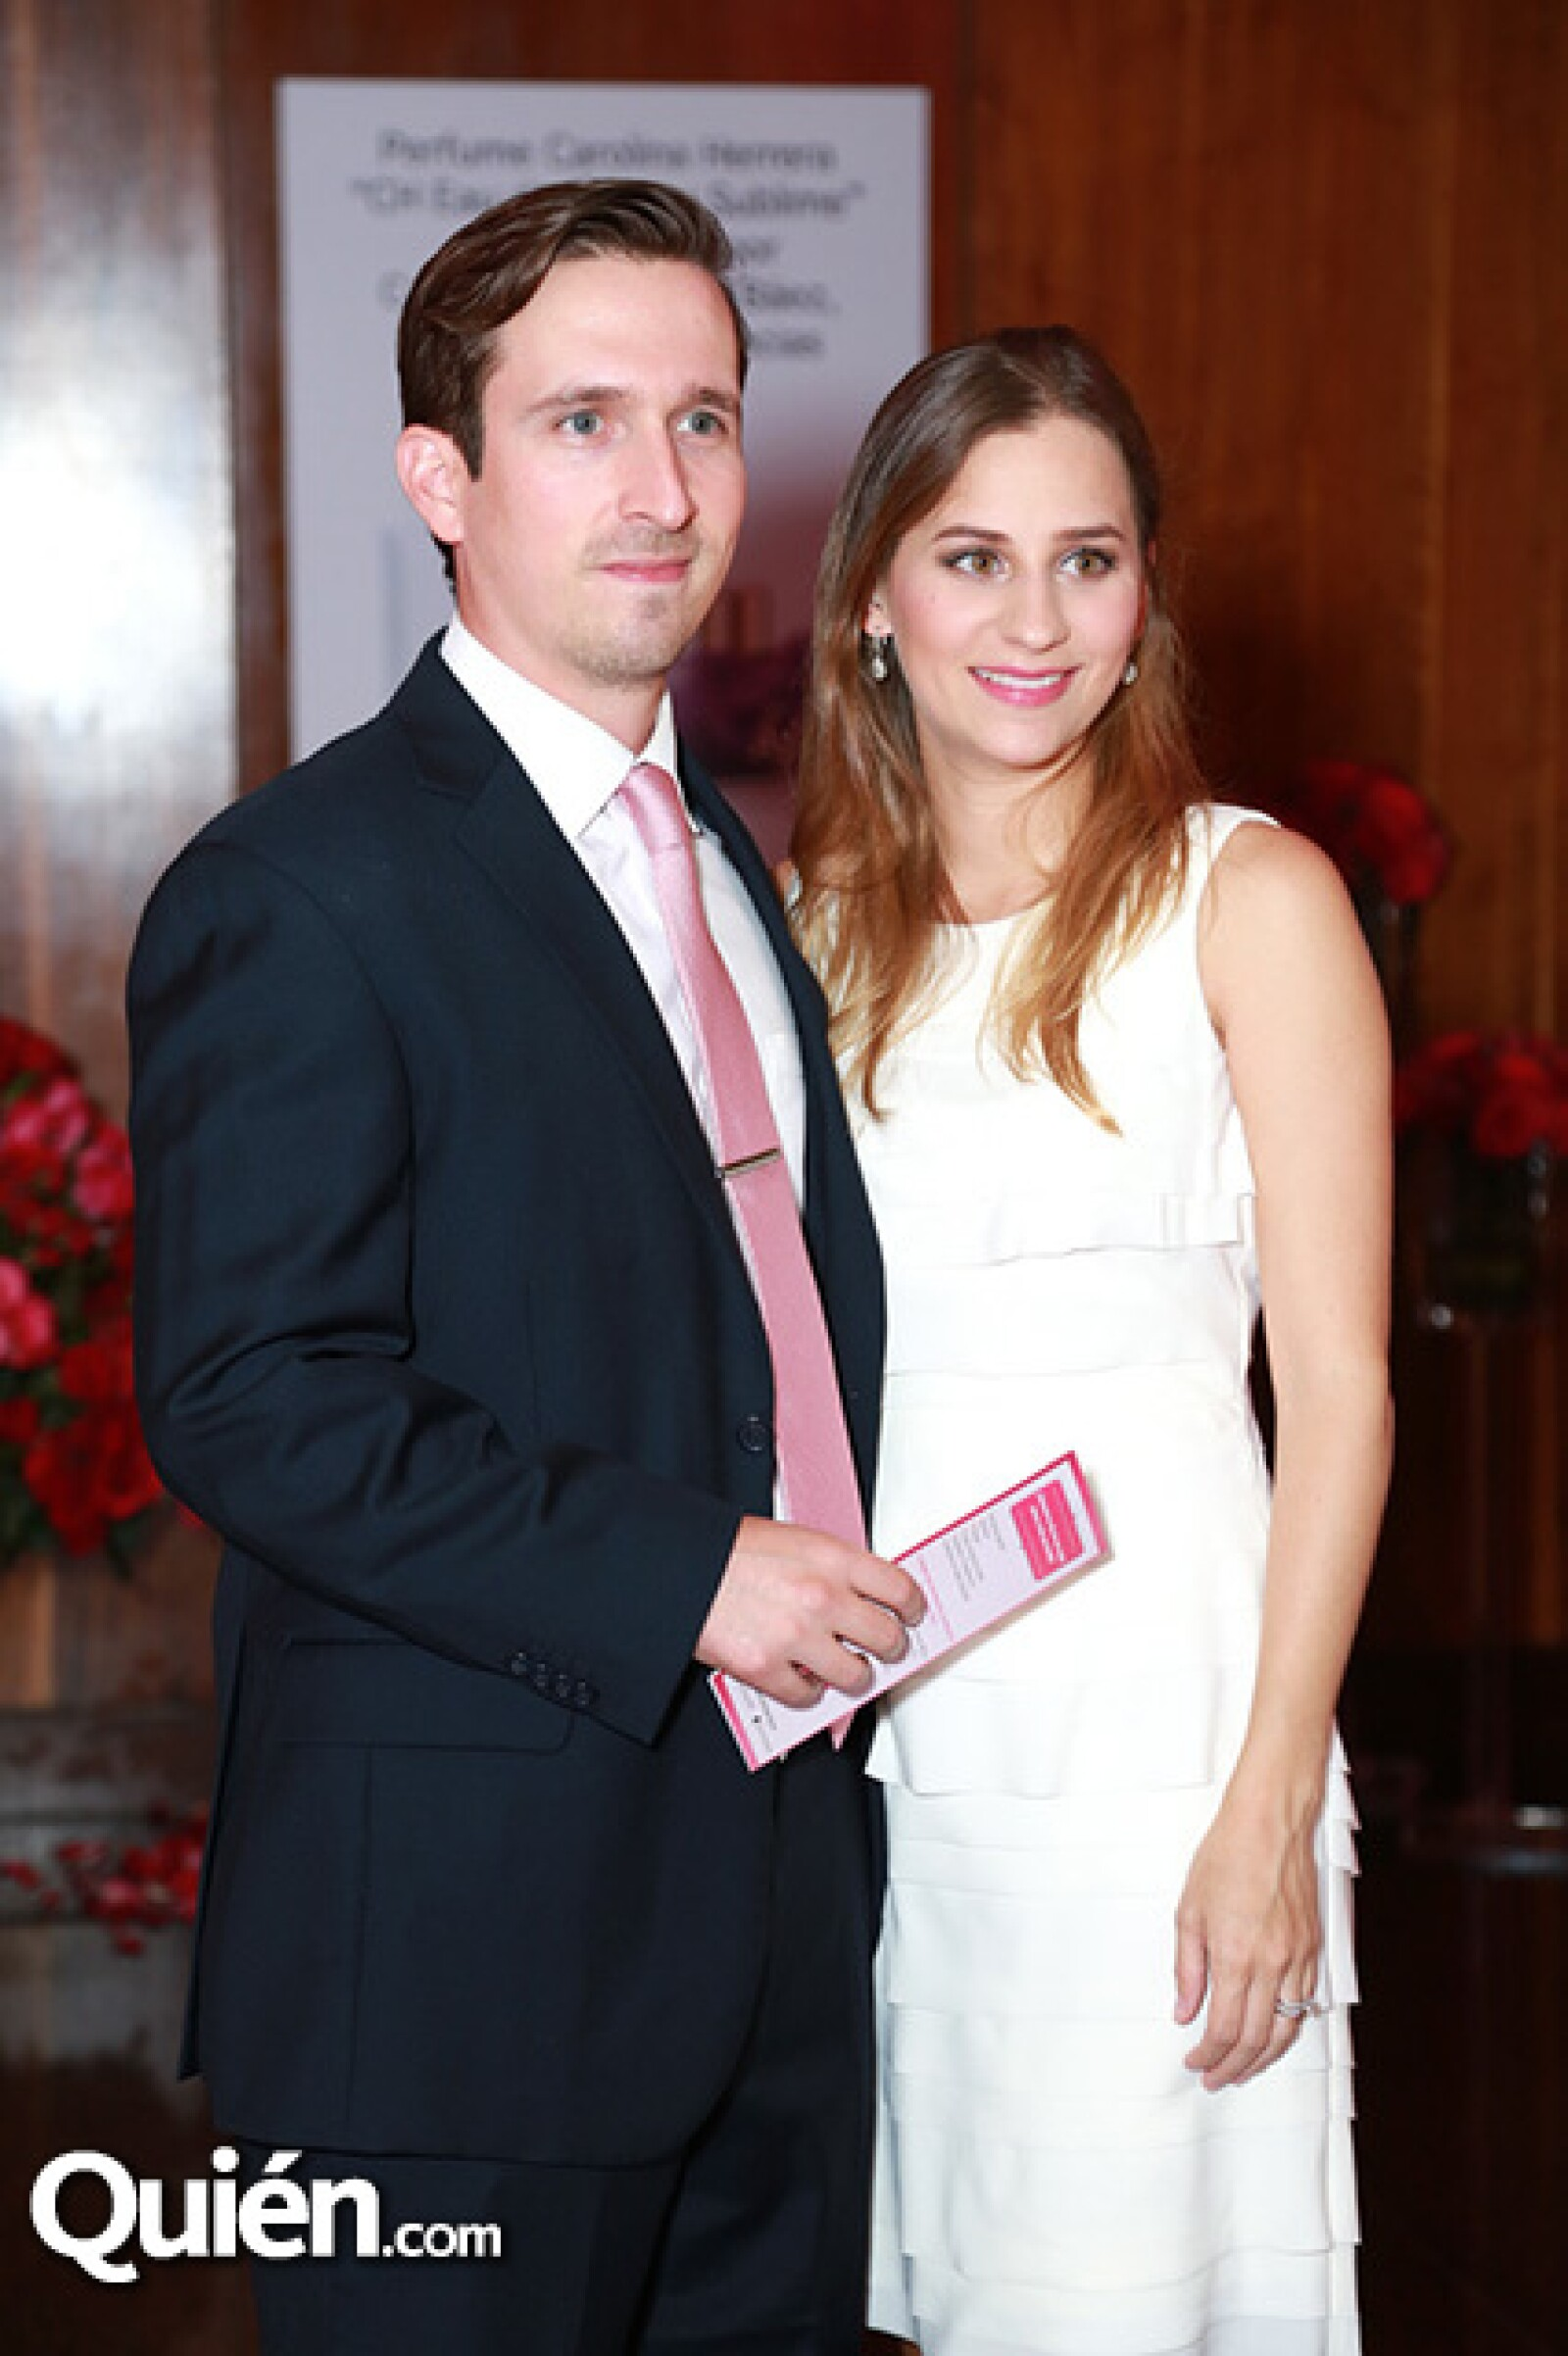 Alex Martínez y Carmen Baxter